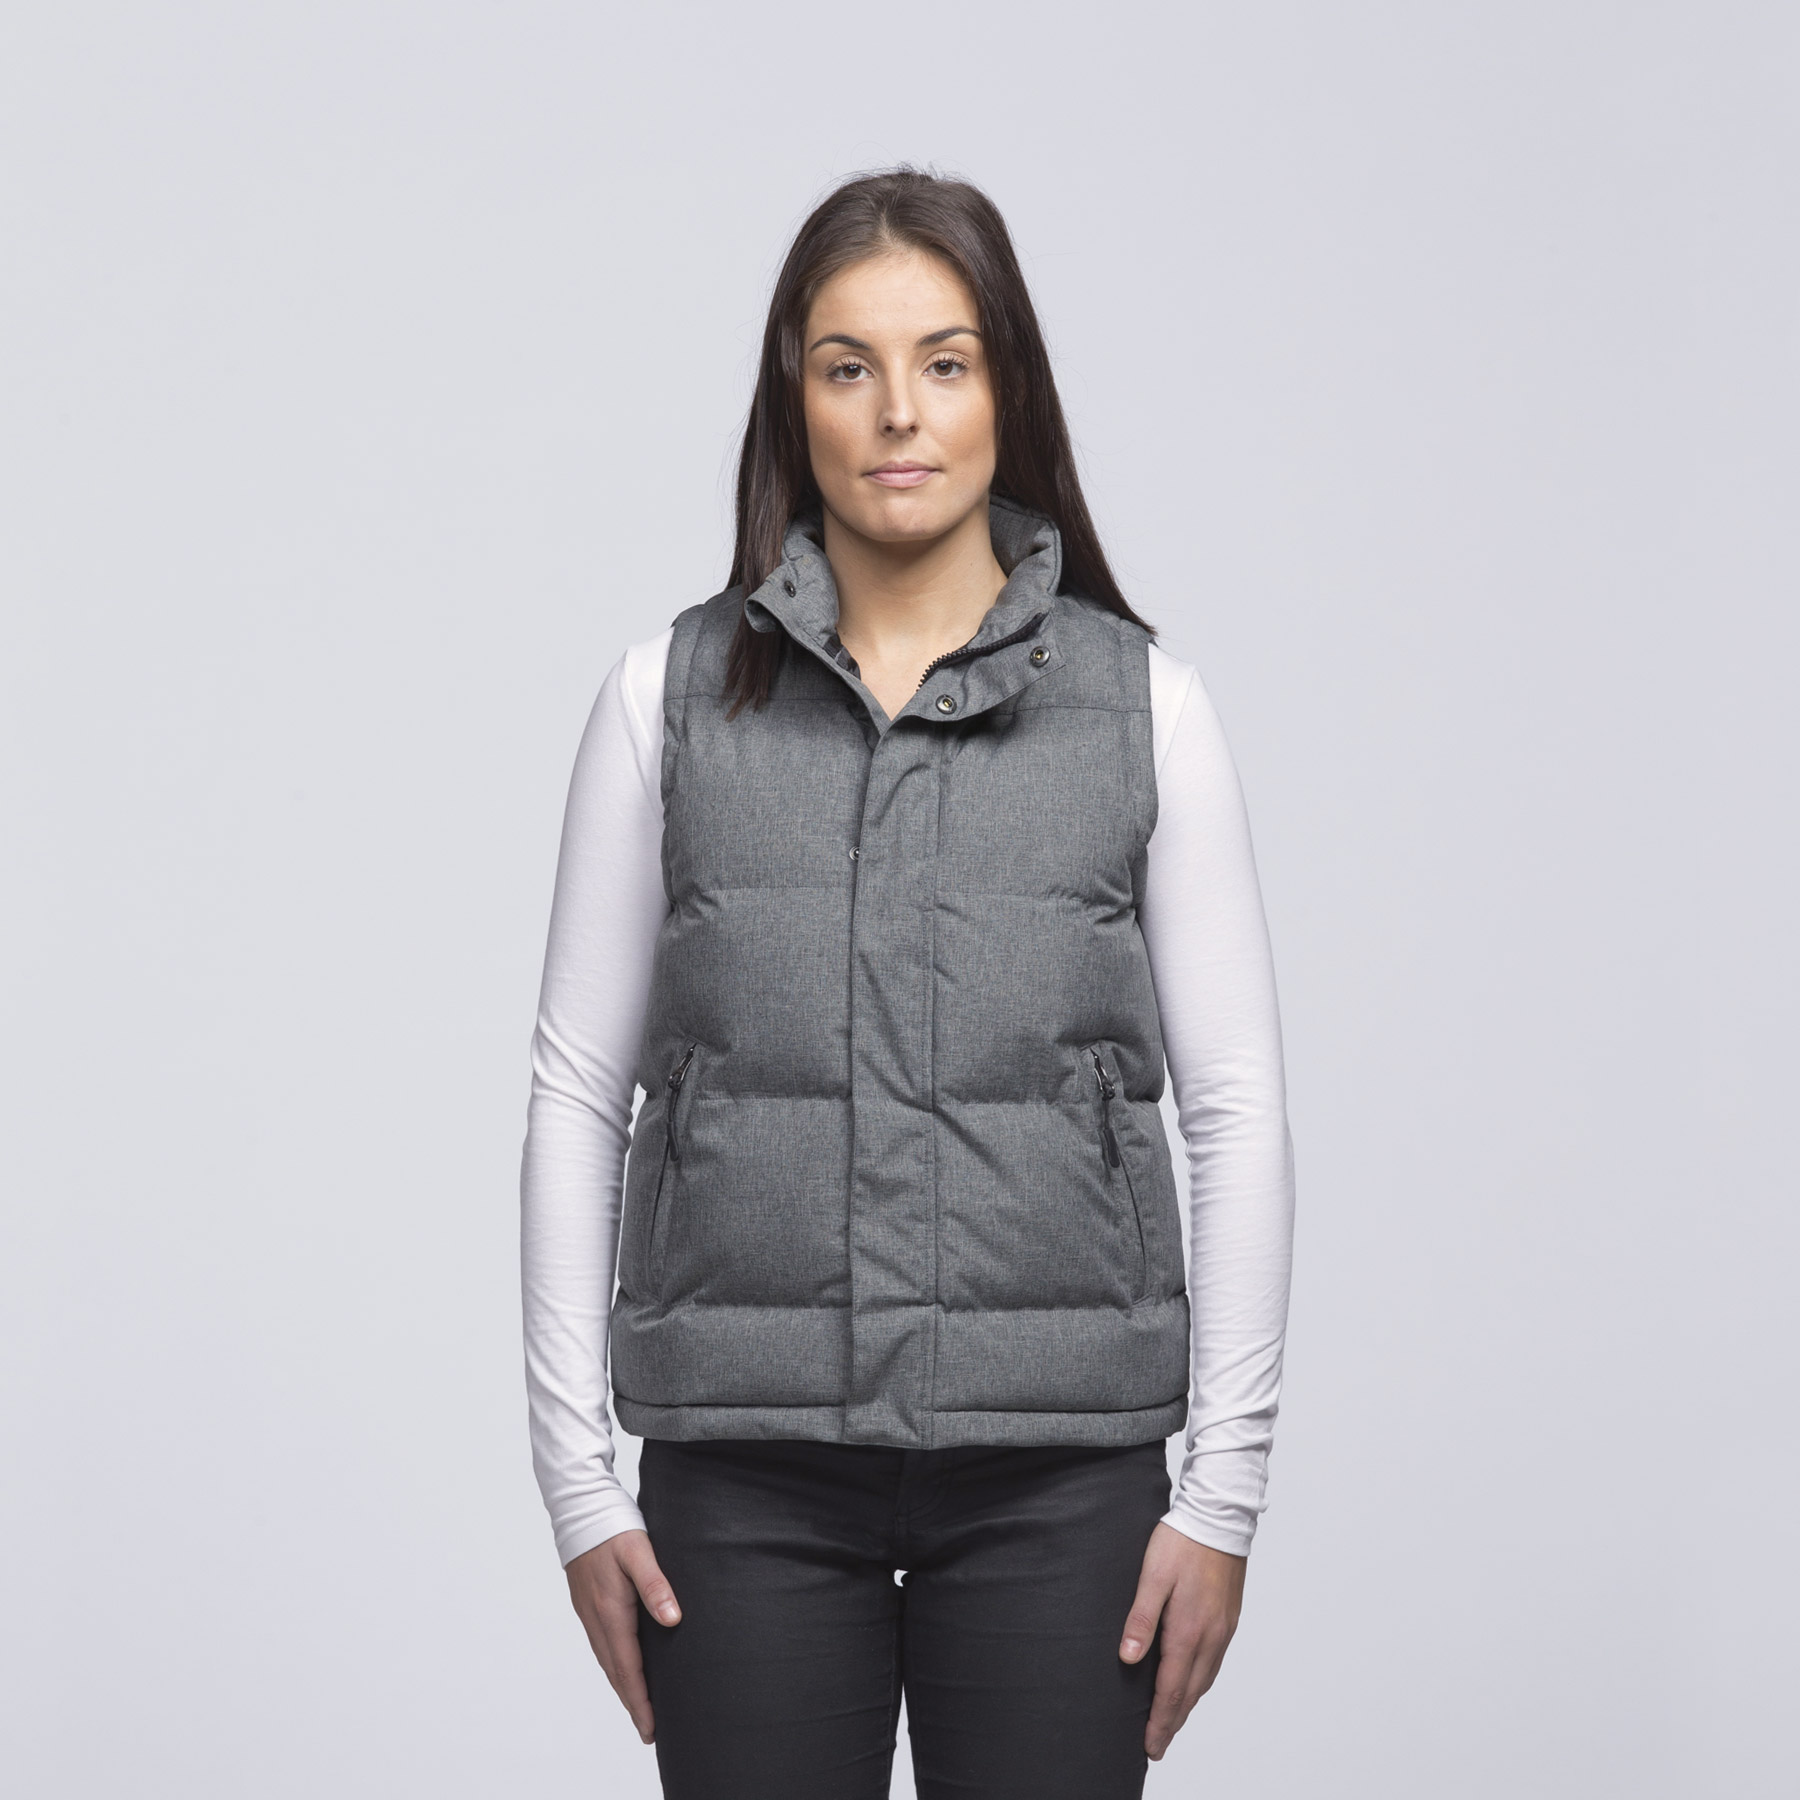 T shirt design queenstown - Smpli Womens Grey Melange Basin Puffa Jacket Front